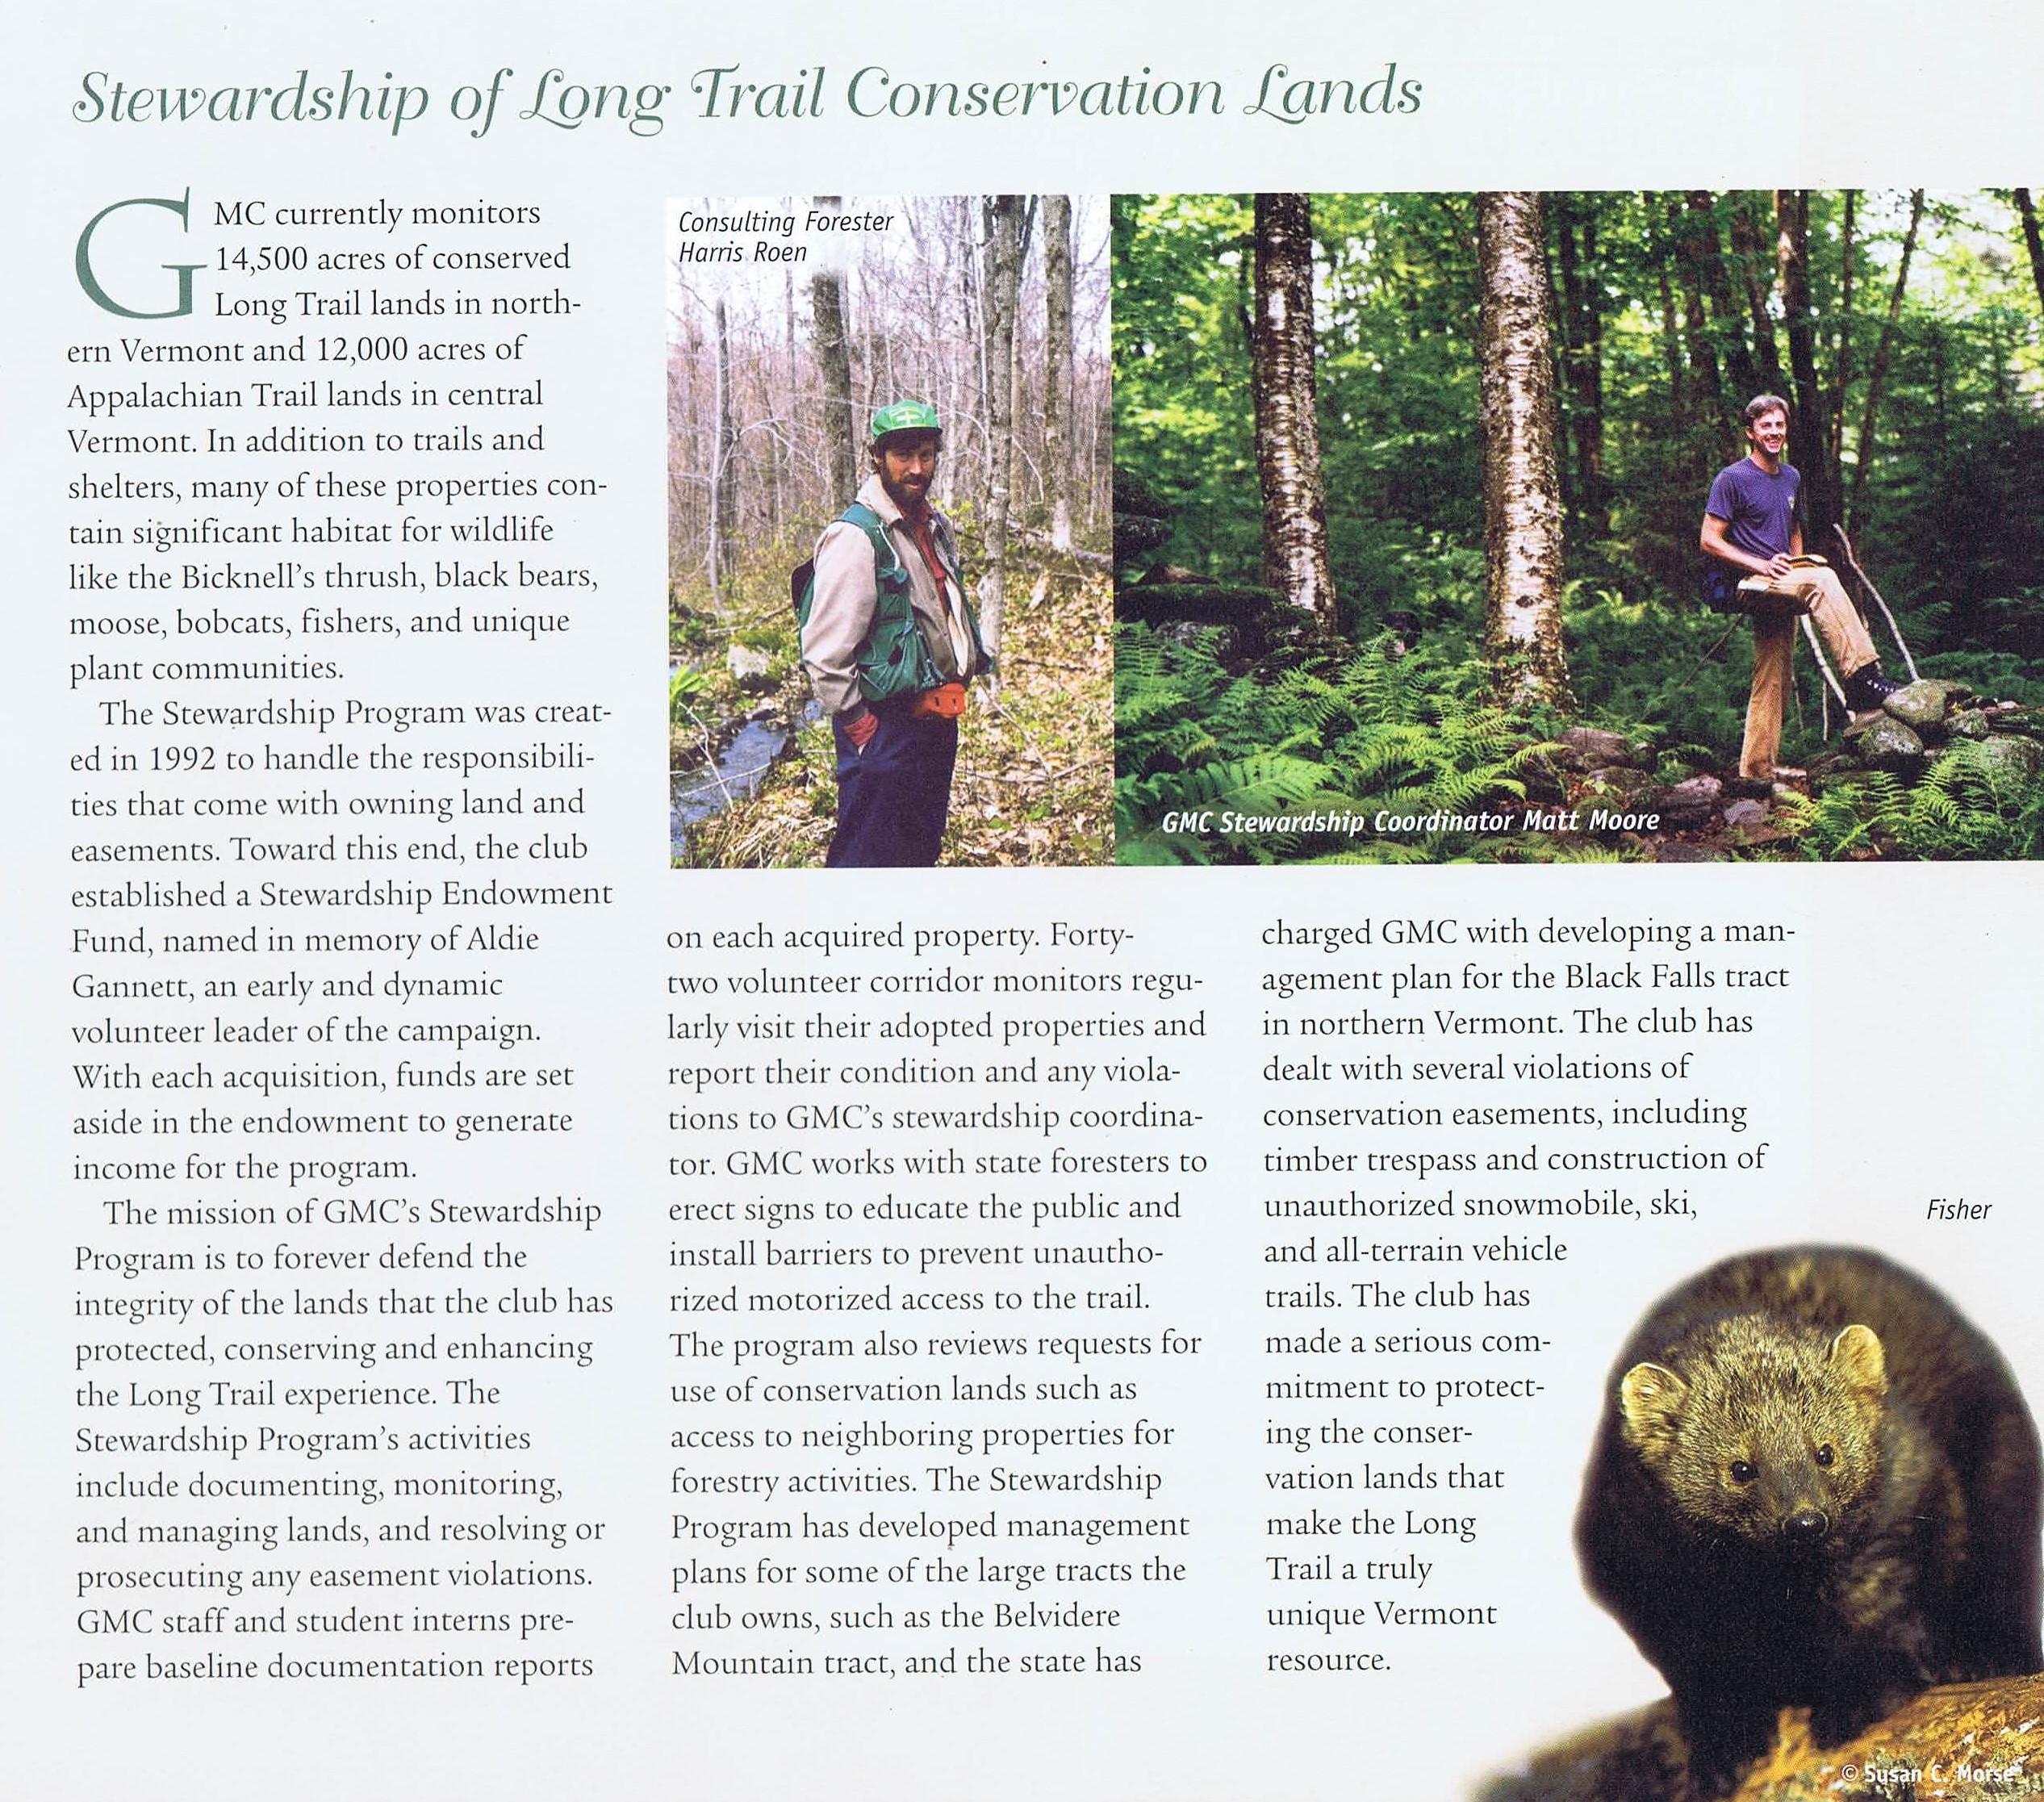 Stewardship of Long Trail Conservation Lands